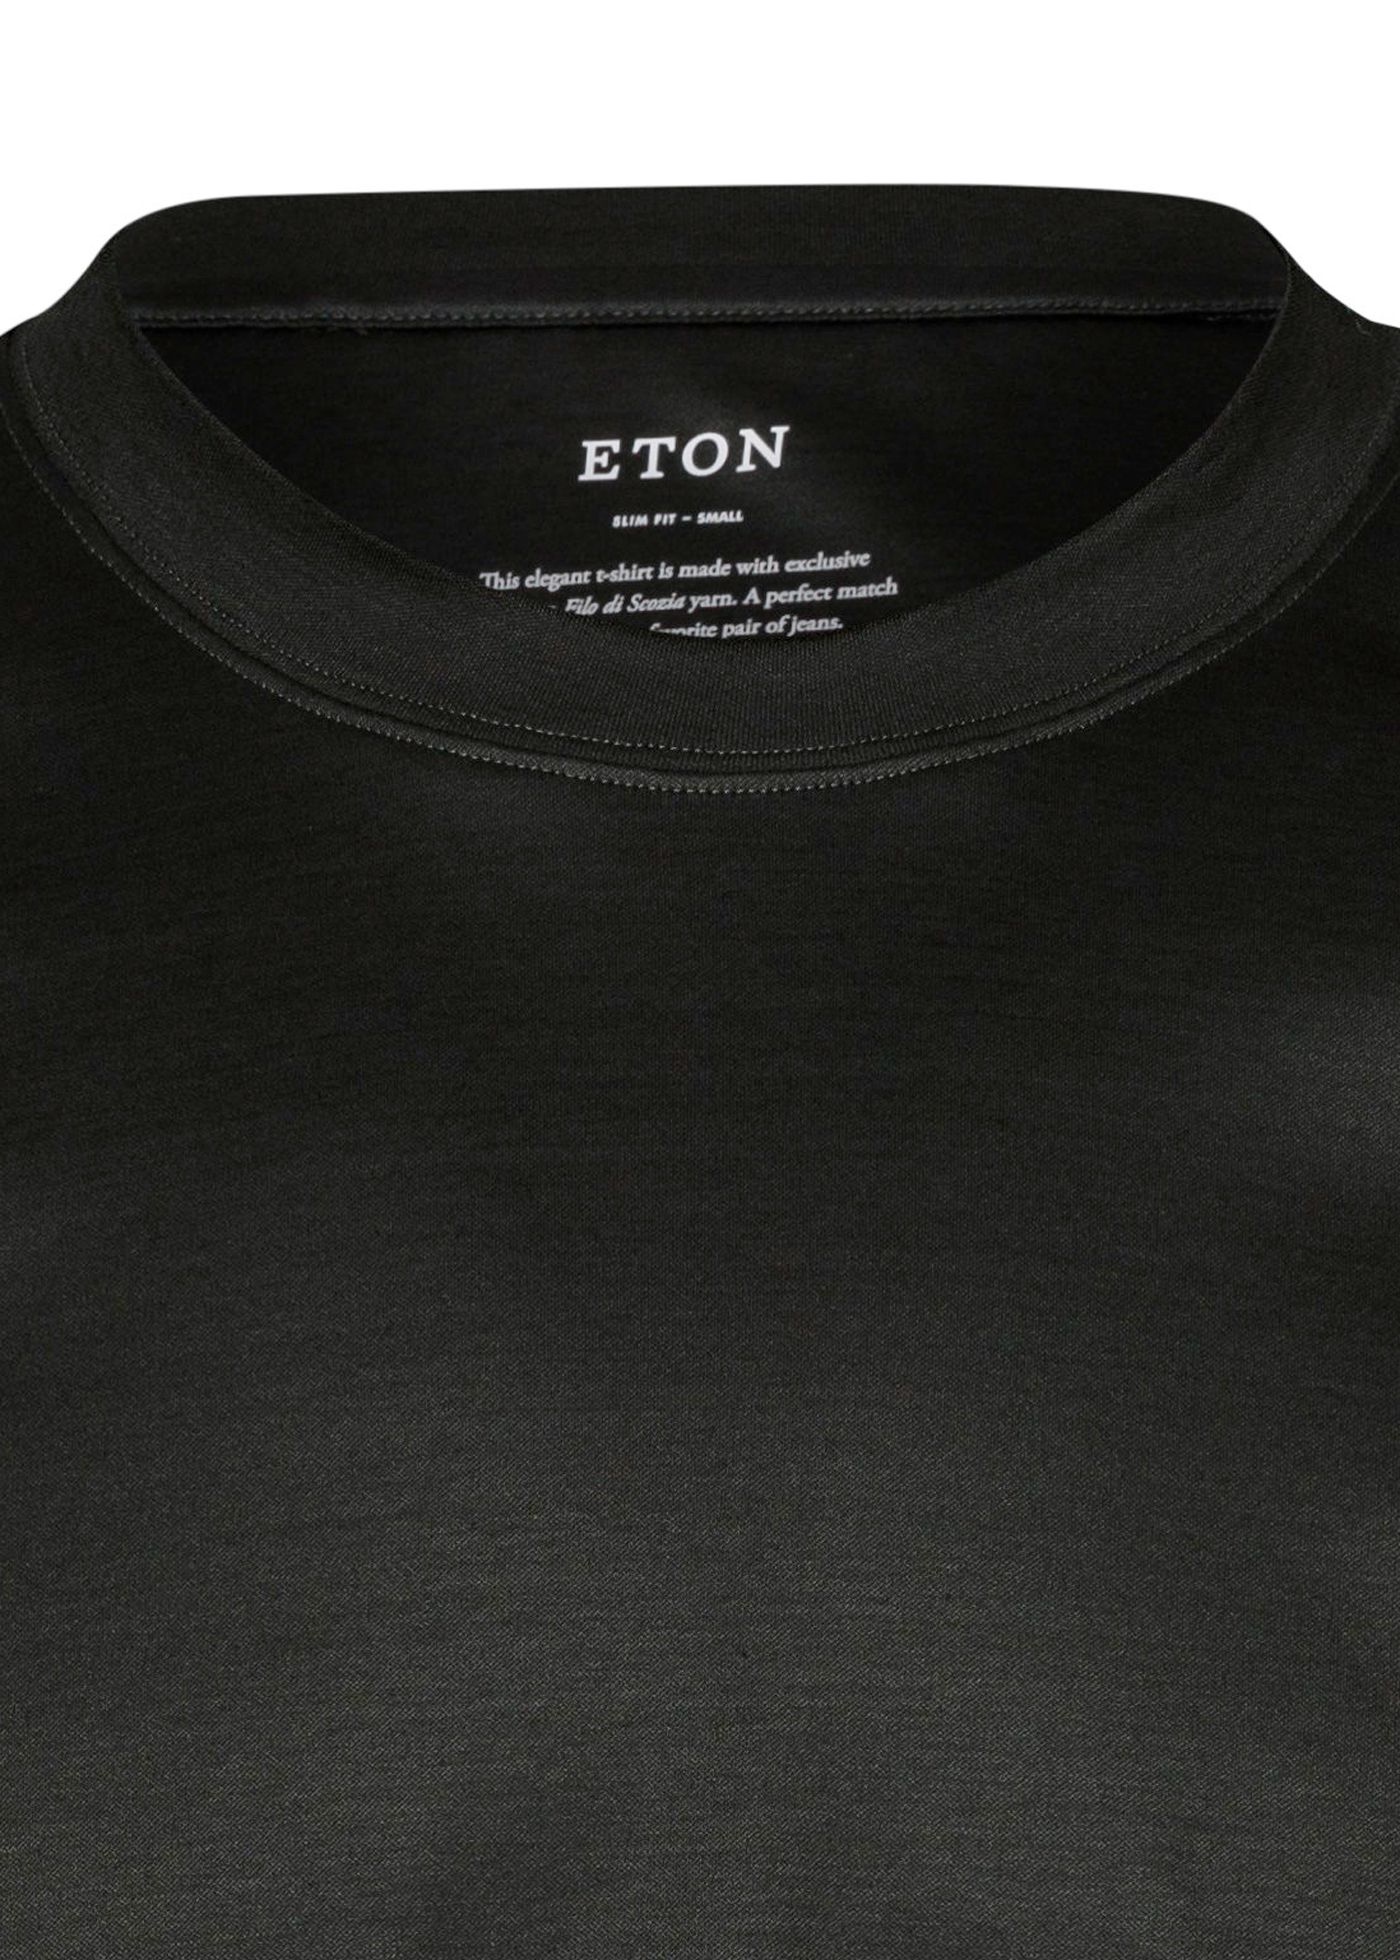 1000023566909 Men shirt: Casual / Jersey image number 2